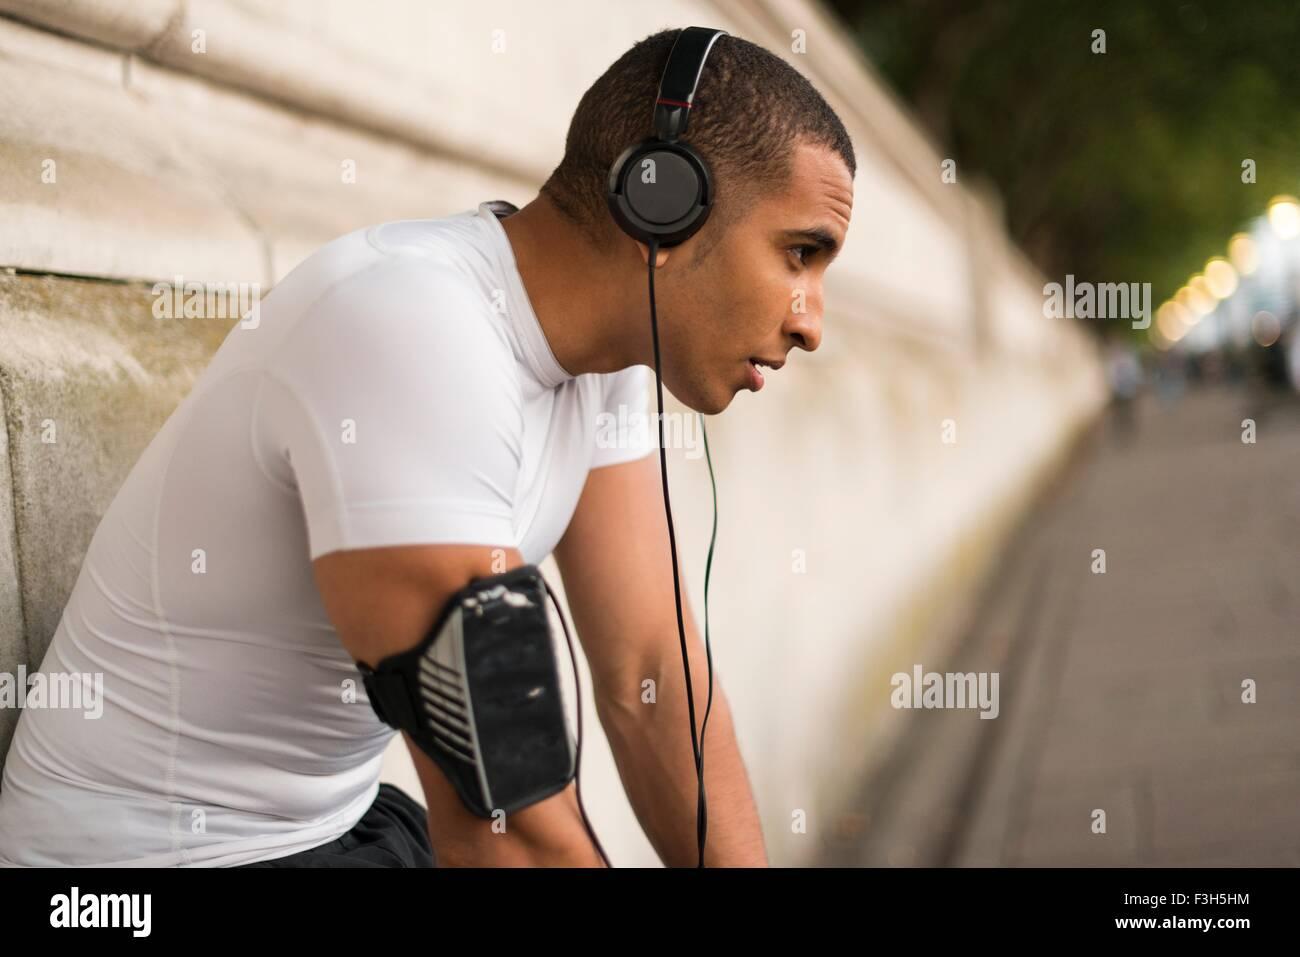 Exhausted male runner wearing headphones taking a break on riverside - Stock Image